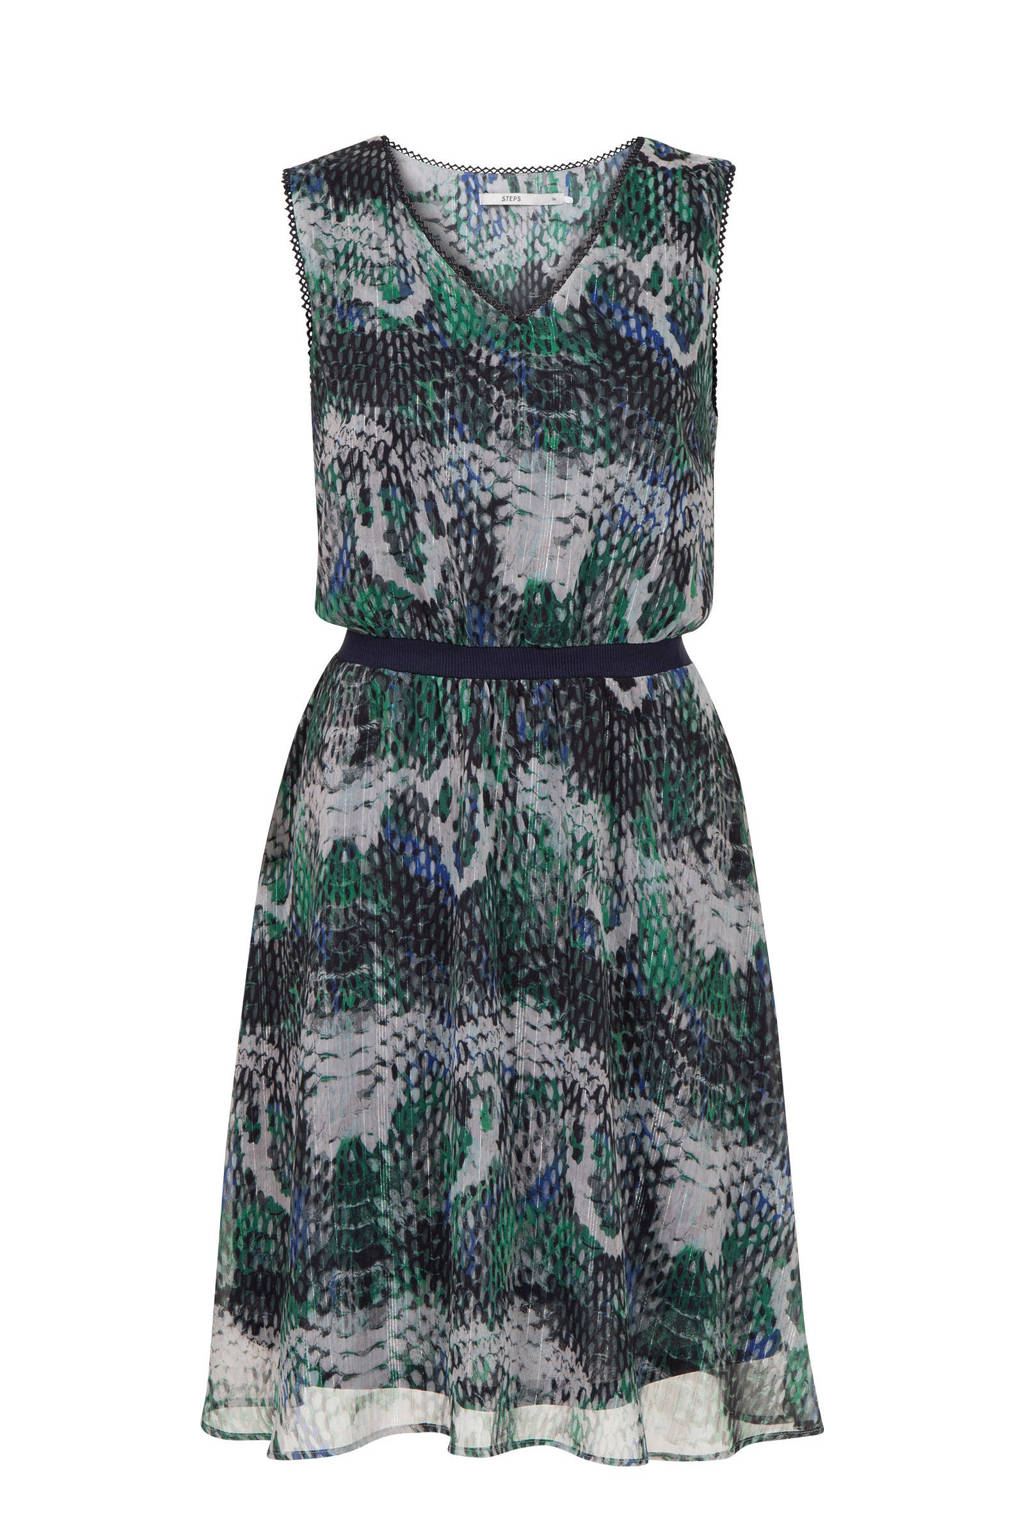 Steps jurk met all over print blauw multi, Blauw multi